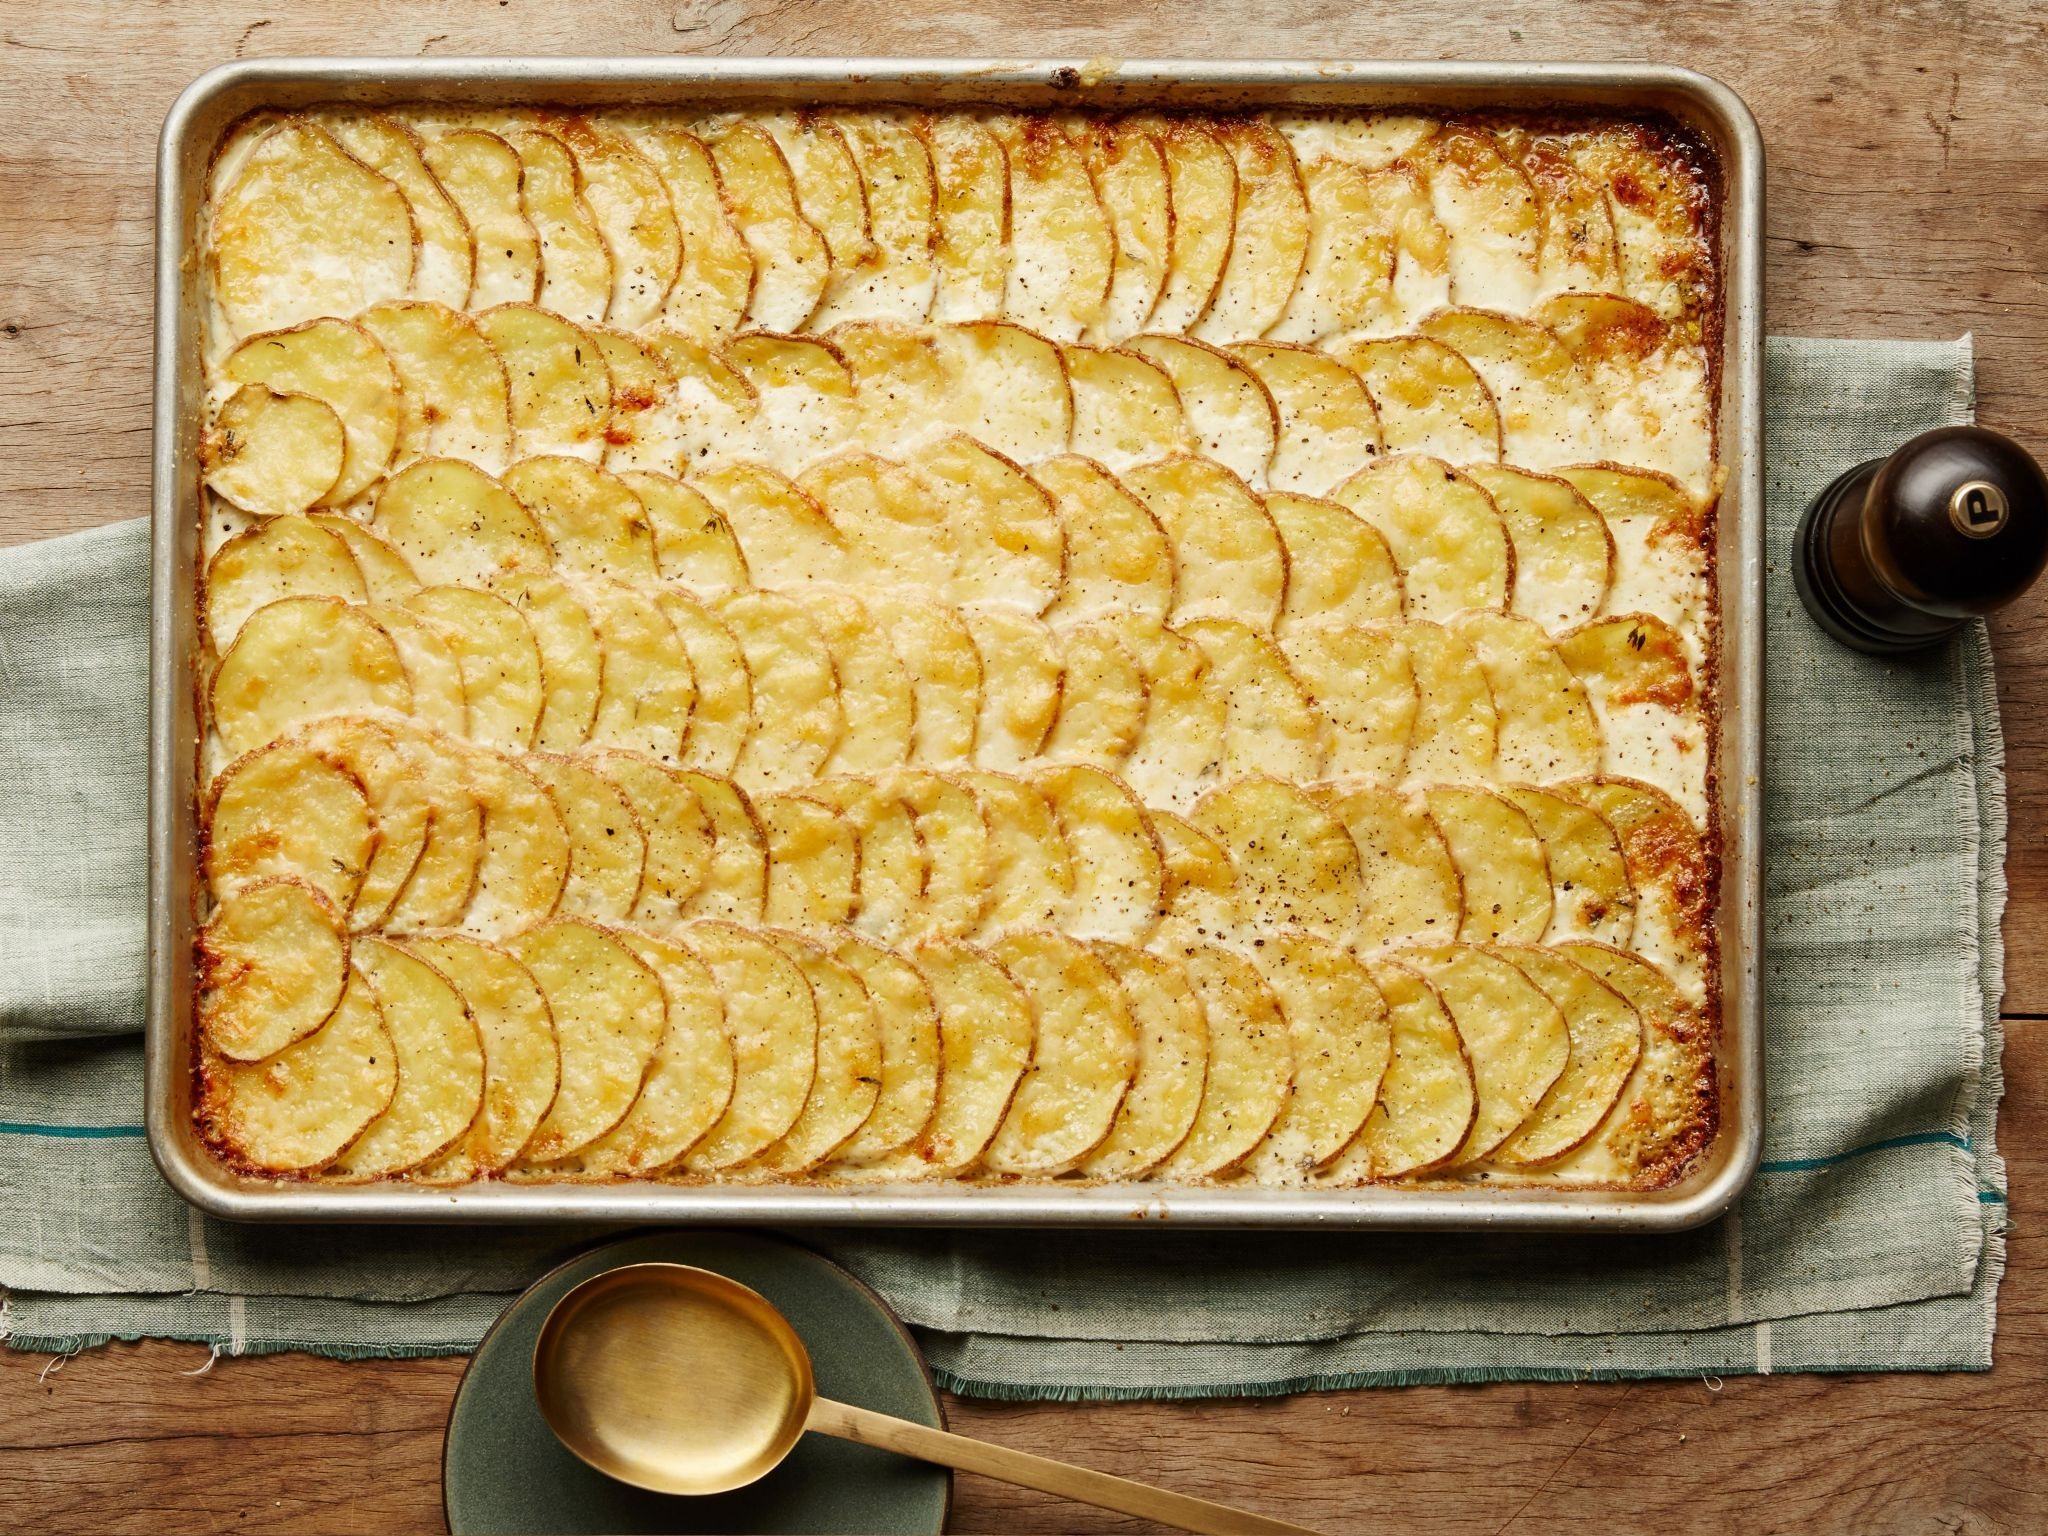 Allcrust sheetpan scalloped potatoes recipe